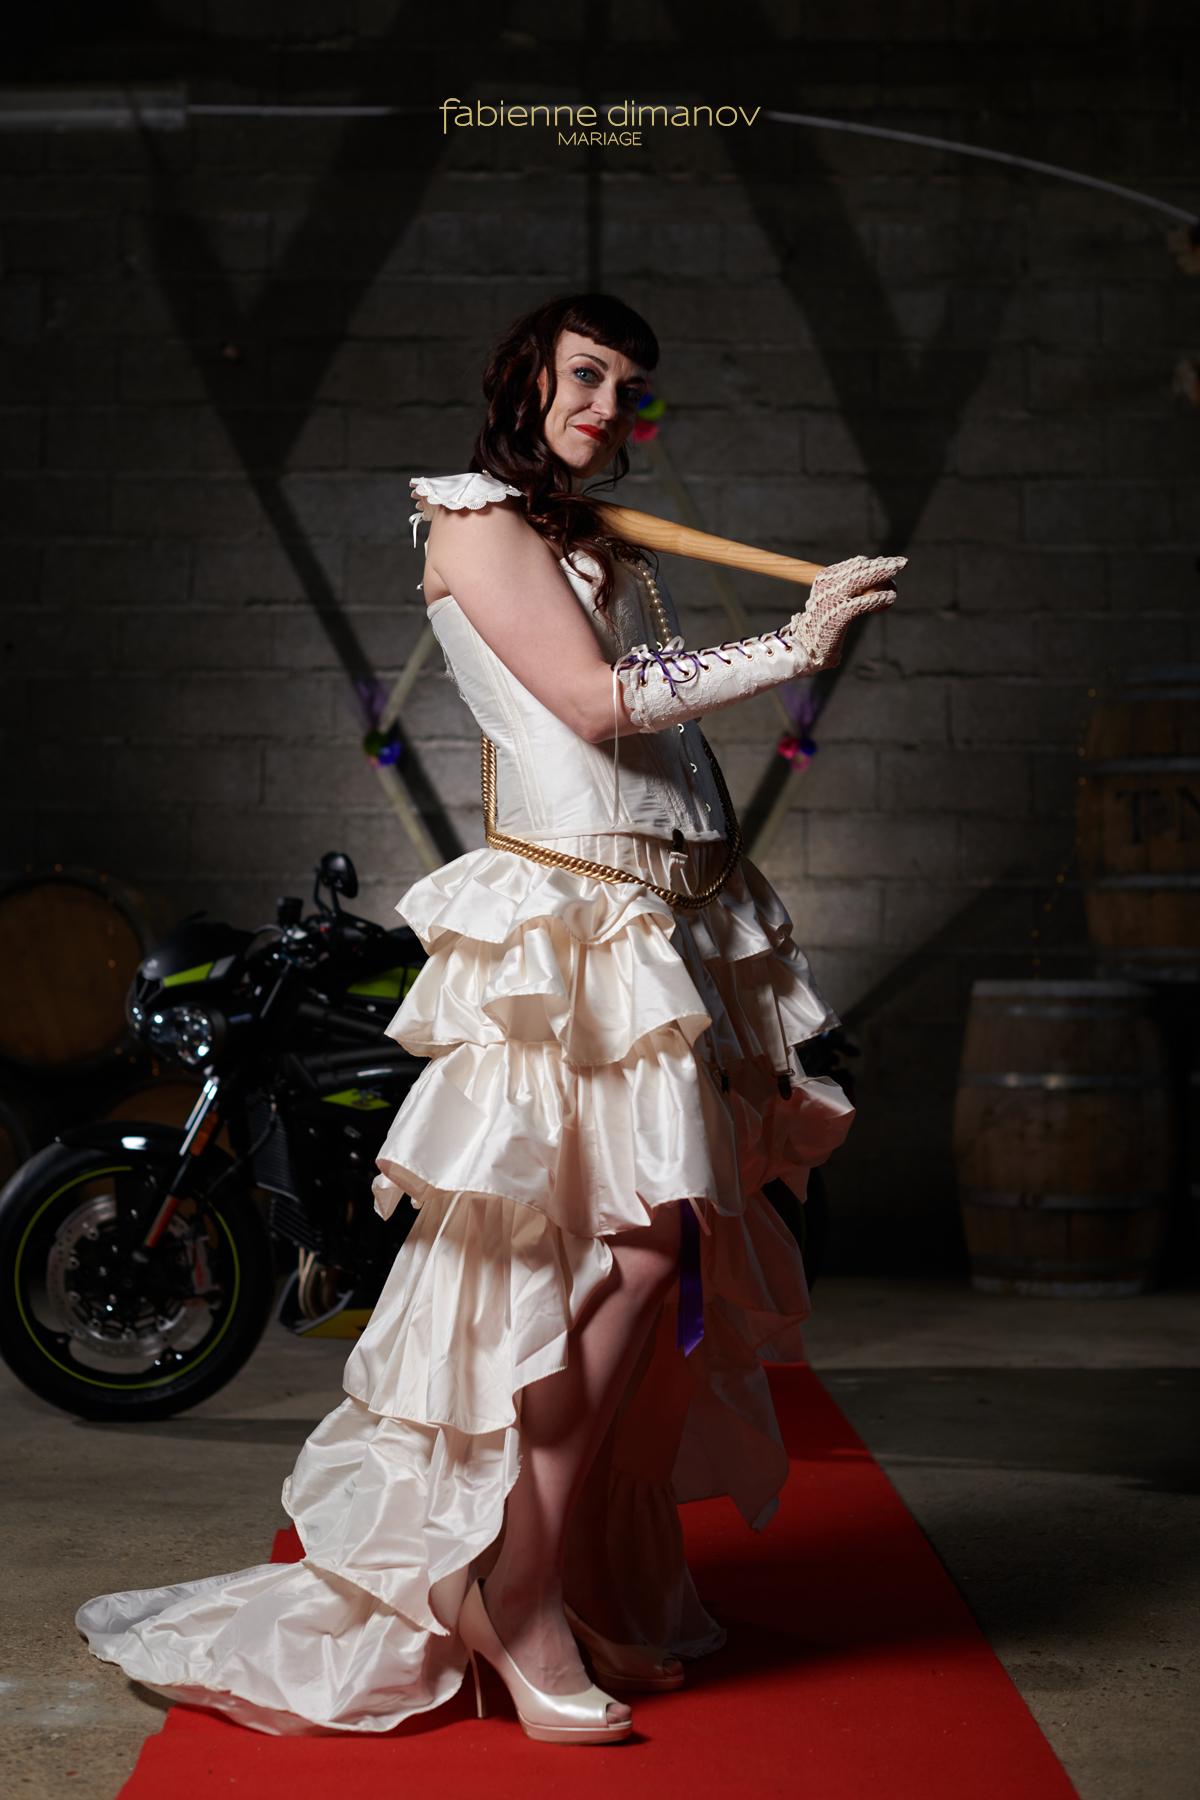 Harley Quinn & Joker Wedding – Fabienne Dimanov Mariage